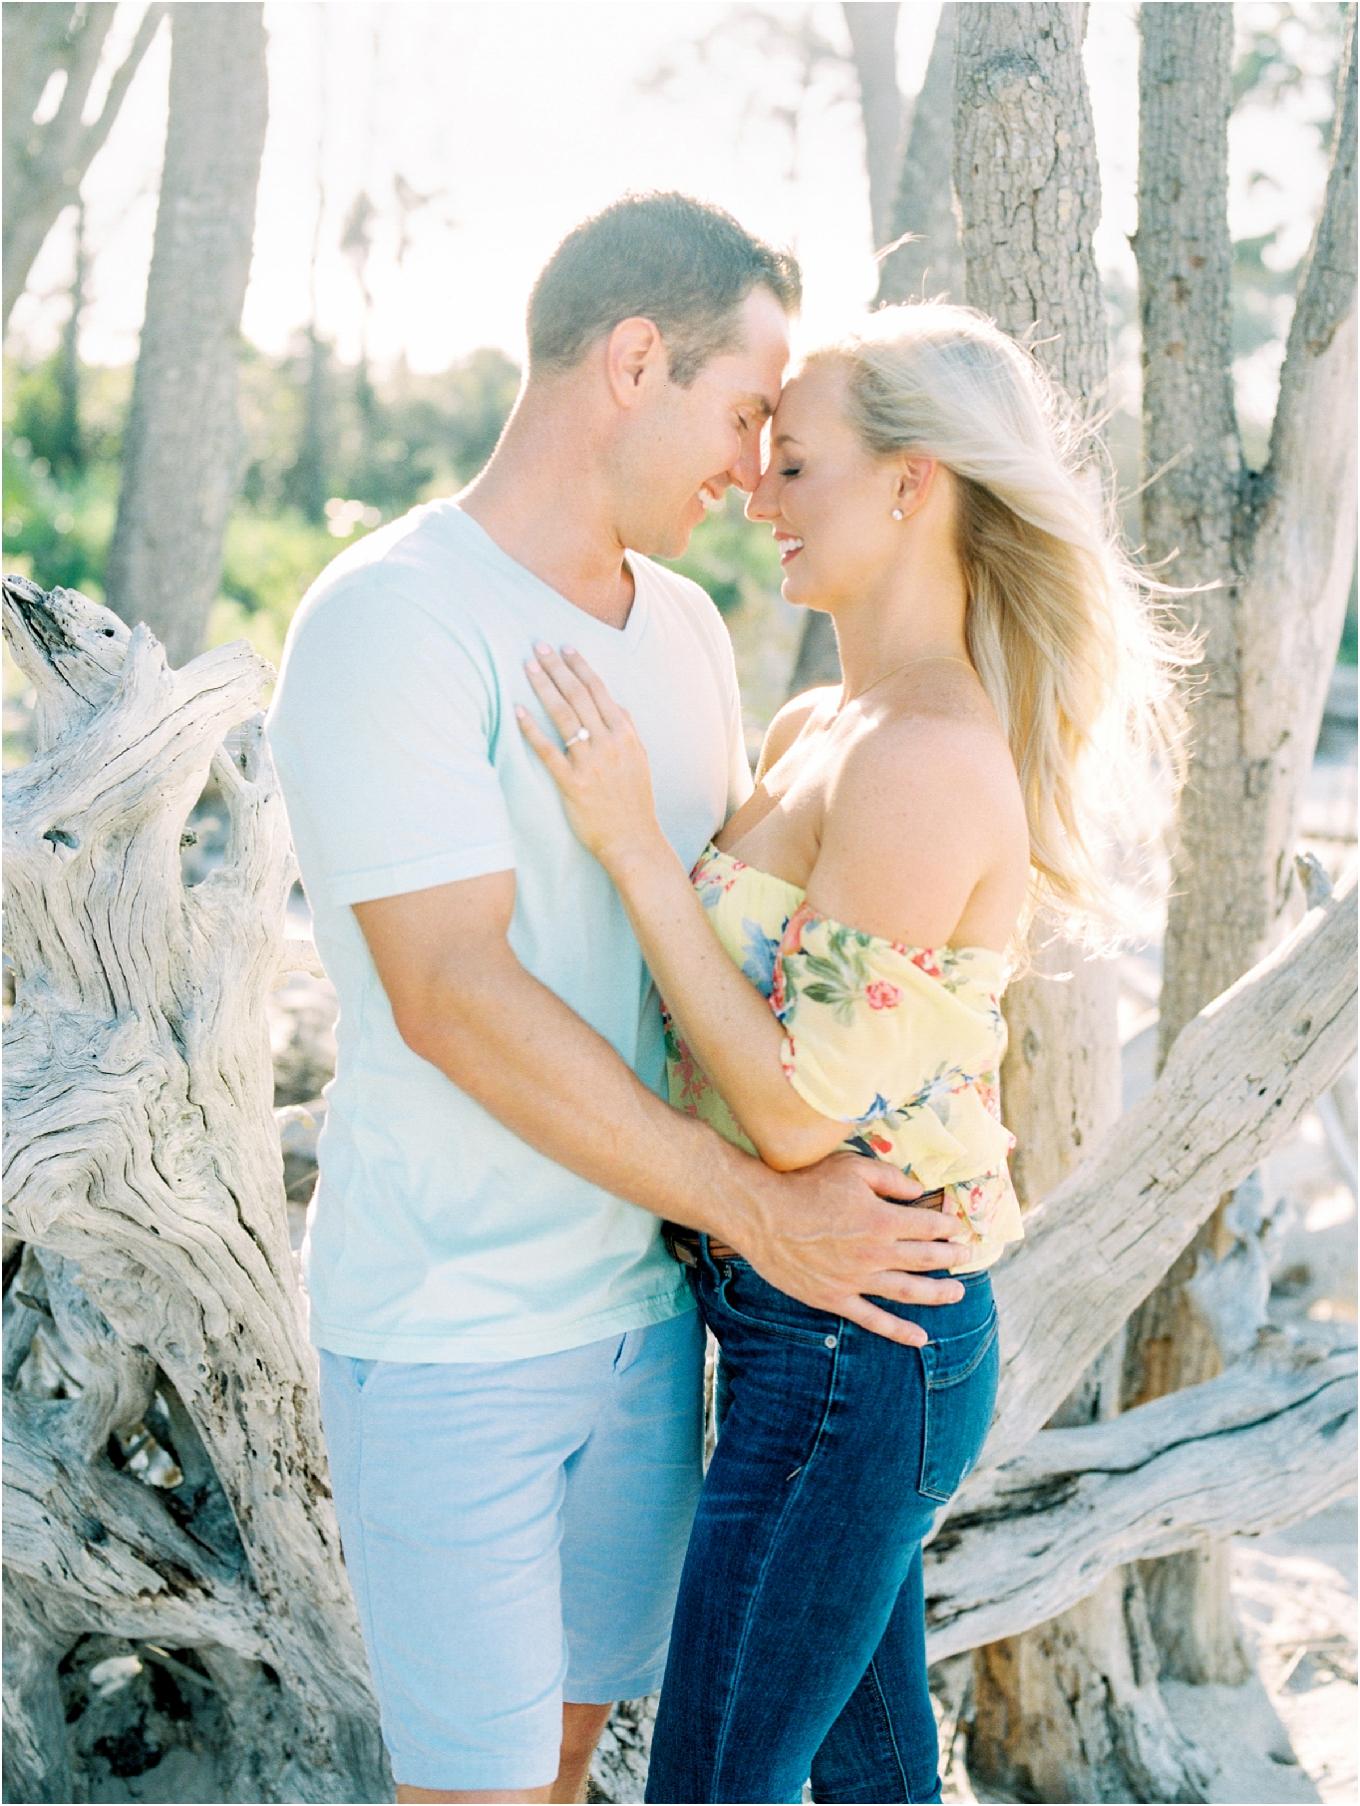 Lisa Silva Photography- Ponte Vedra Beach and Jacksonville, Florida Fine Art Film Wedding Photography- Engagement Shoot at Big Talbot Island_0011.jpg